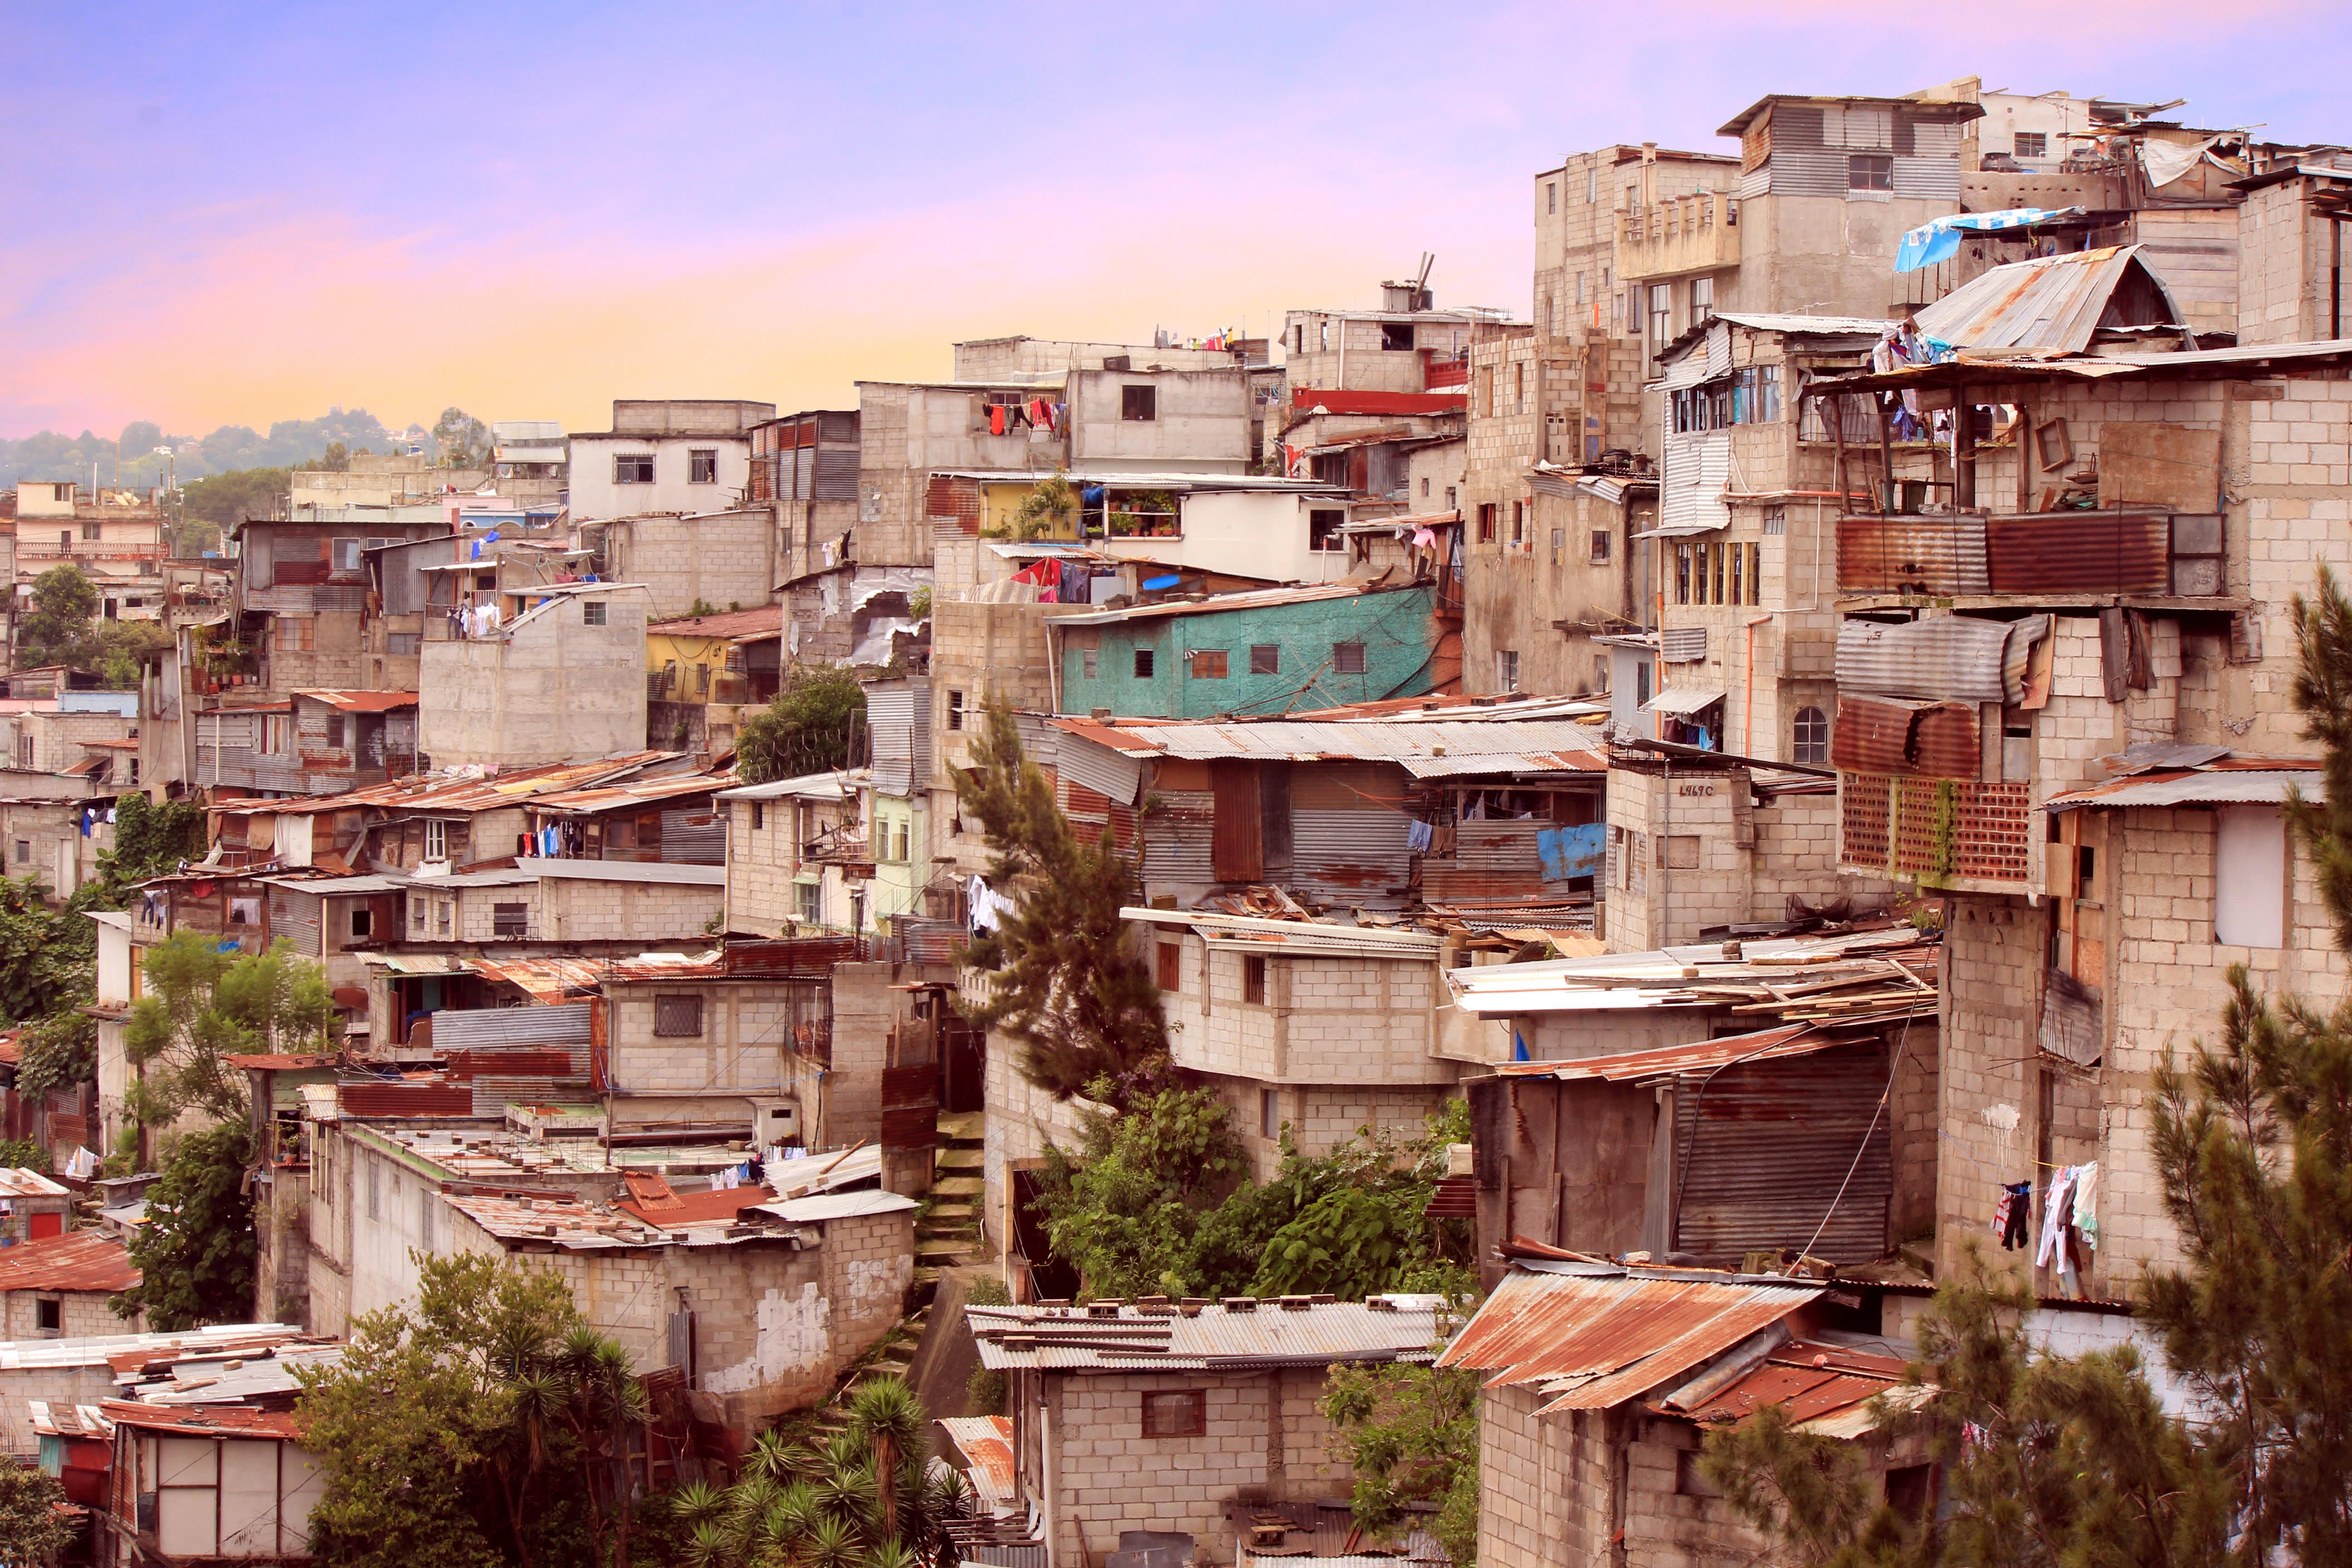 Siedlung in Guatemala Stadt